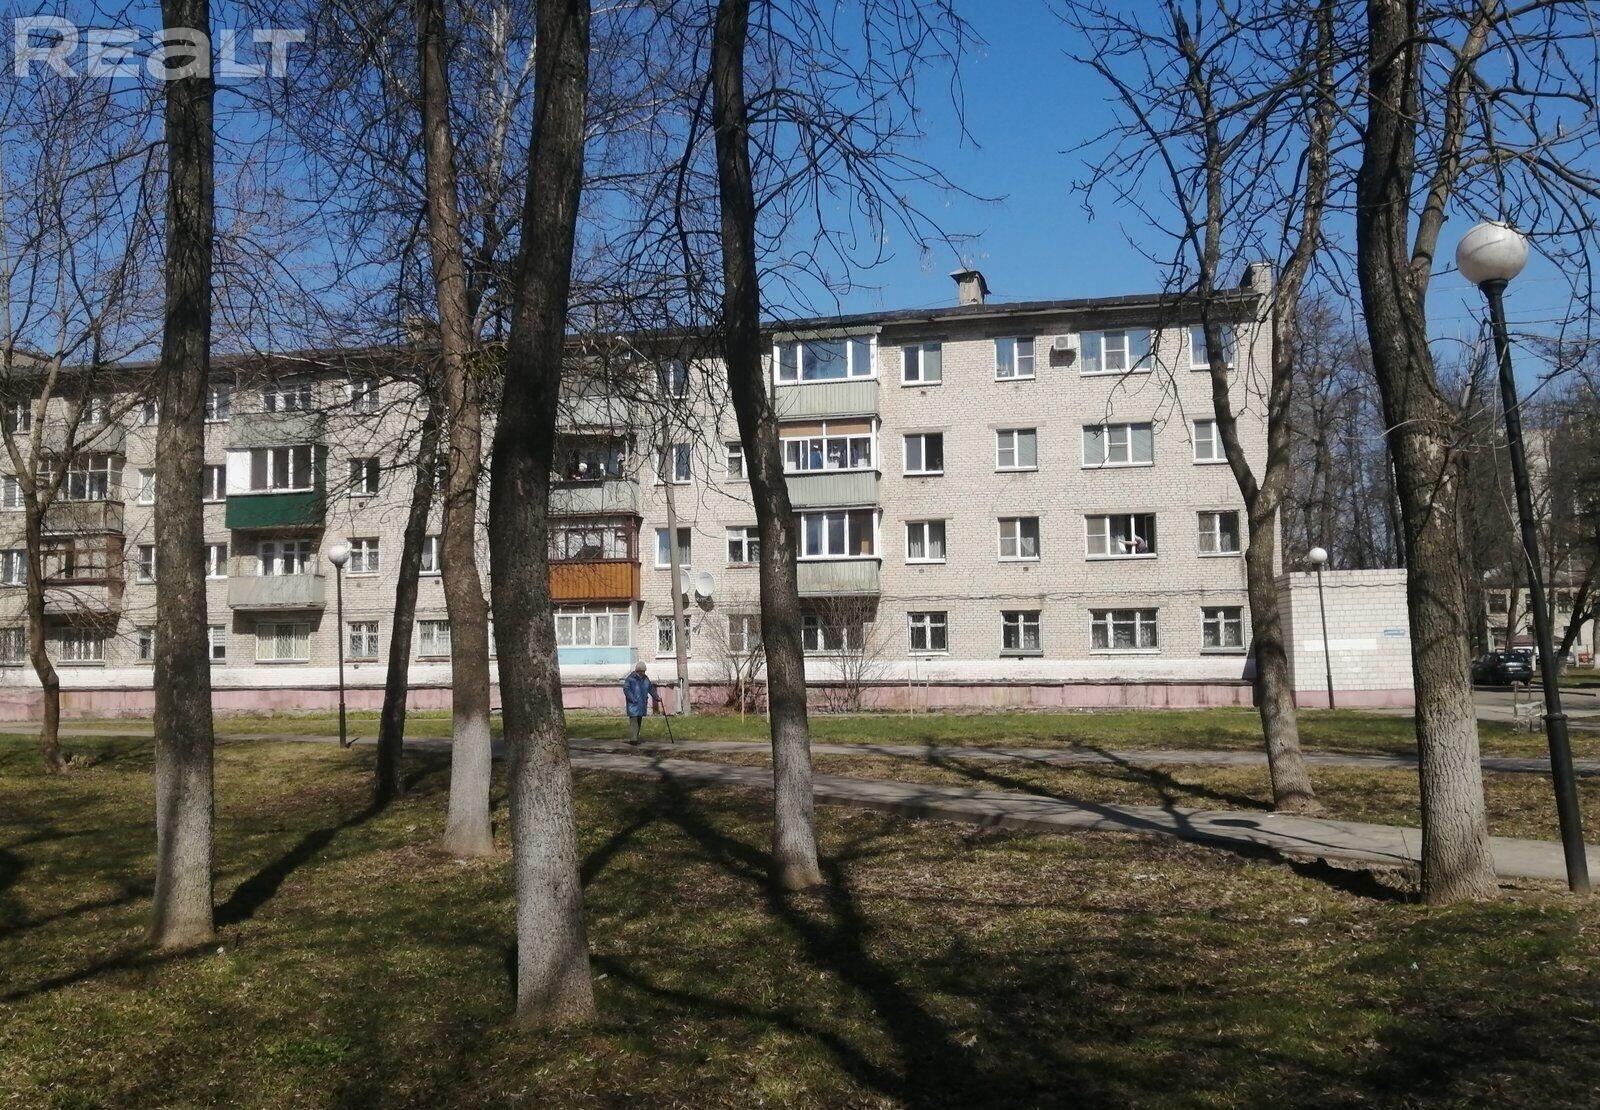 Продажа 2-х комнатной квартиры в г. Гомеле, ул. Барыкина, дом 129 (р-н Залинейный). Цена 77 776 руб